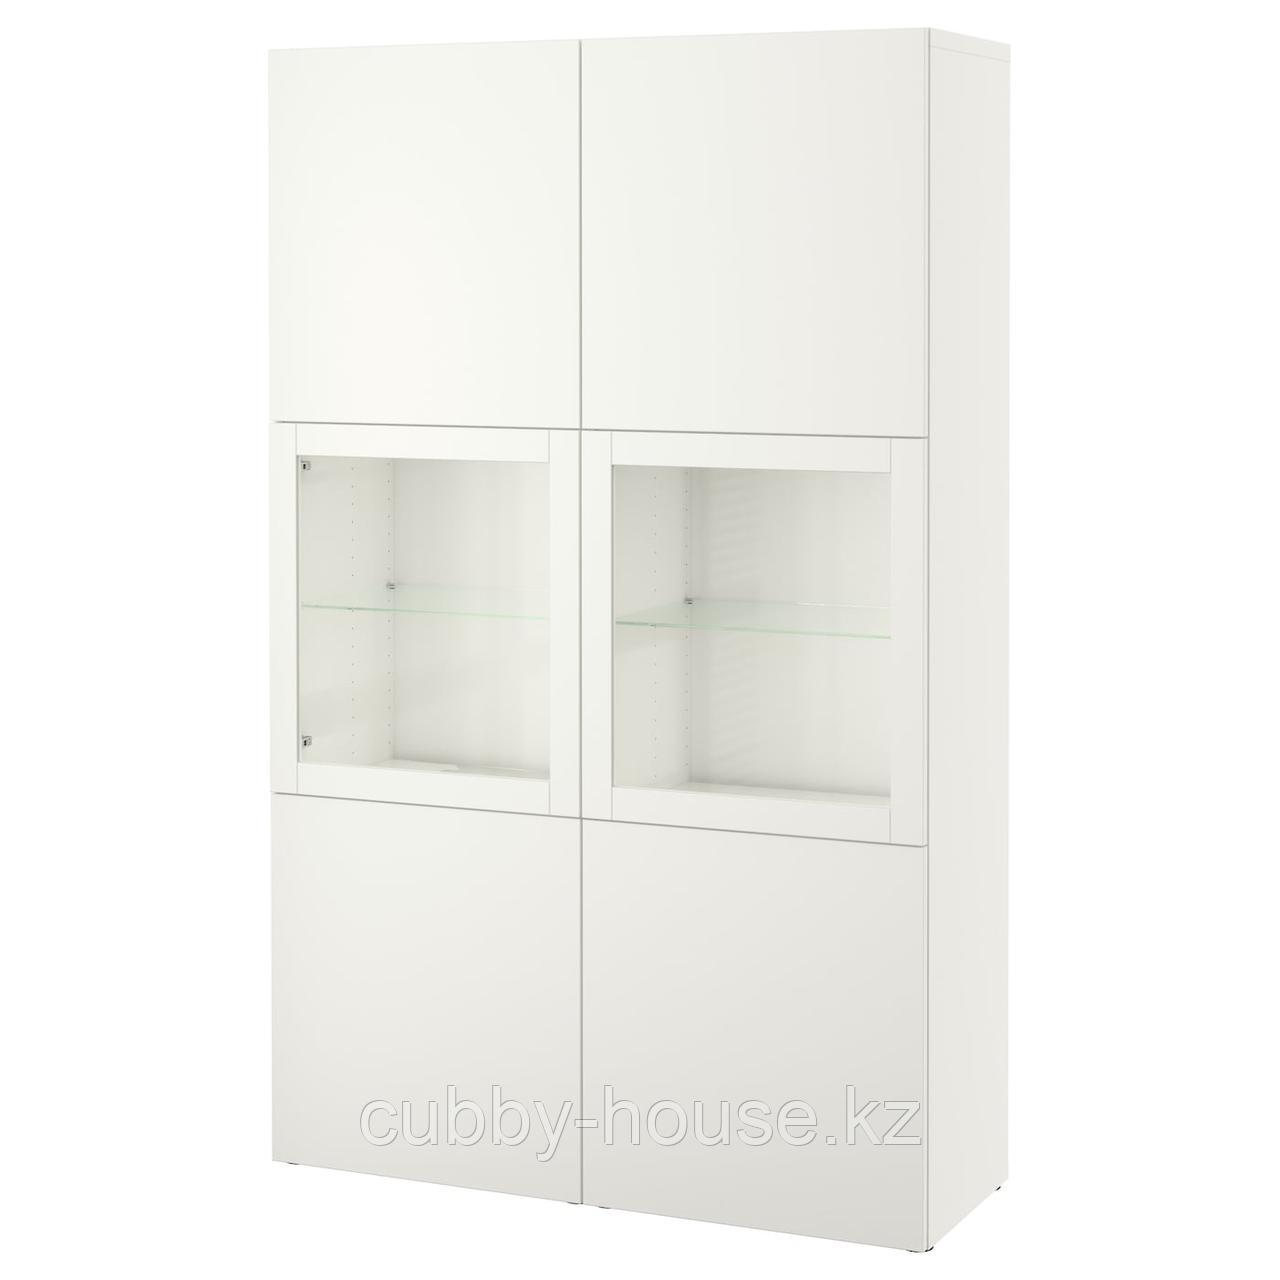 БЕСТО Комбинация д/хранения+стекл дверц, под беленый дуб, Нотвикен синий прозрачное стекло, 120x42x192 см